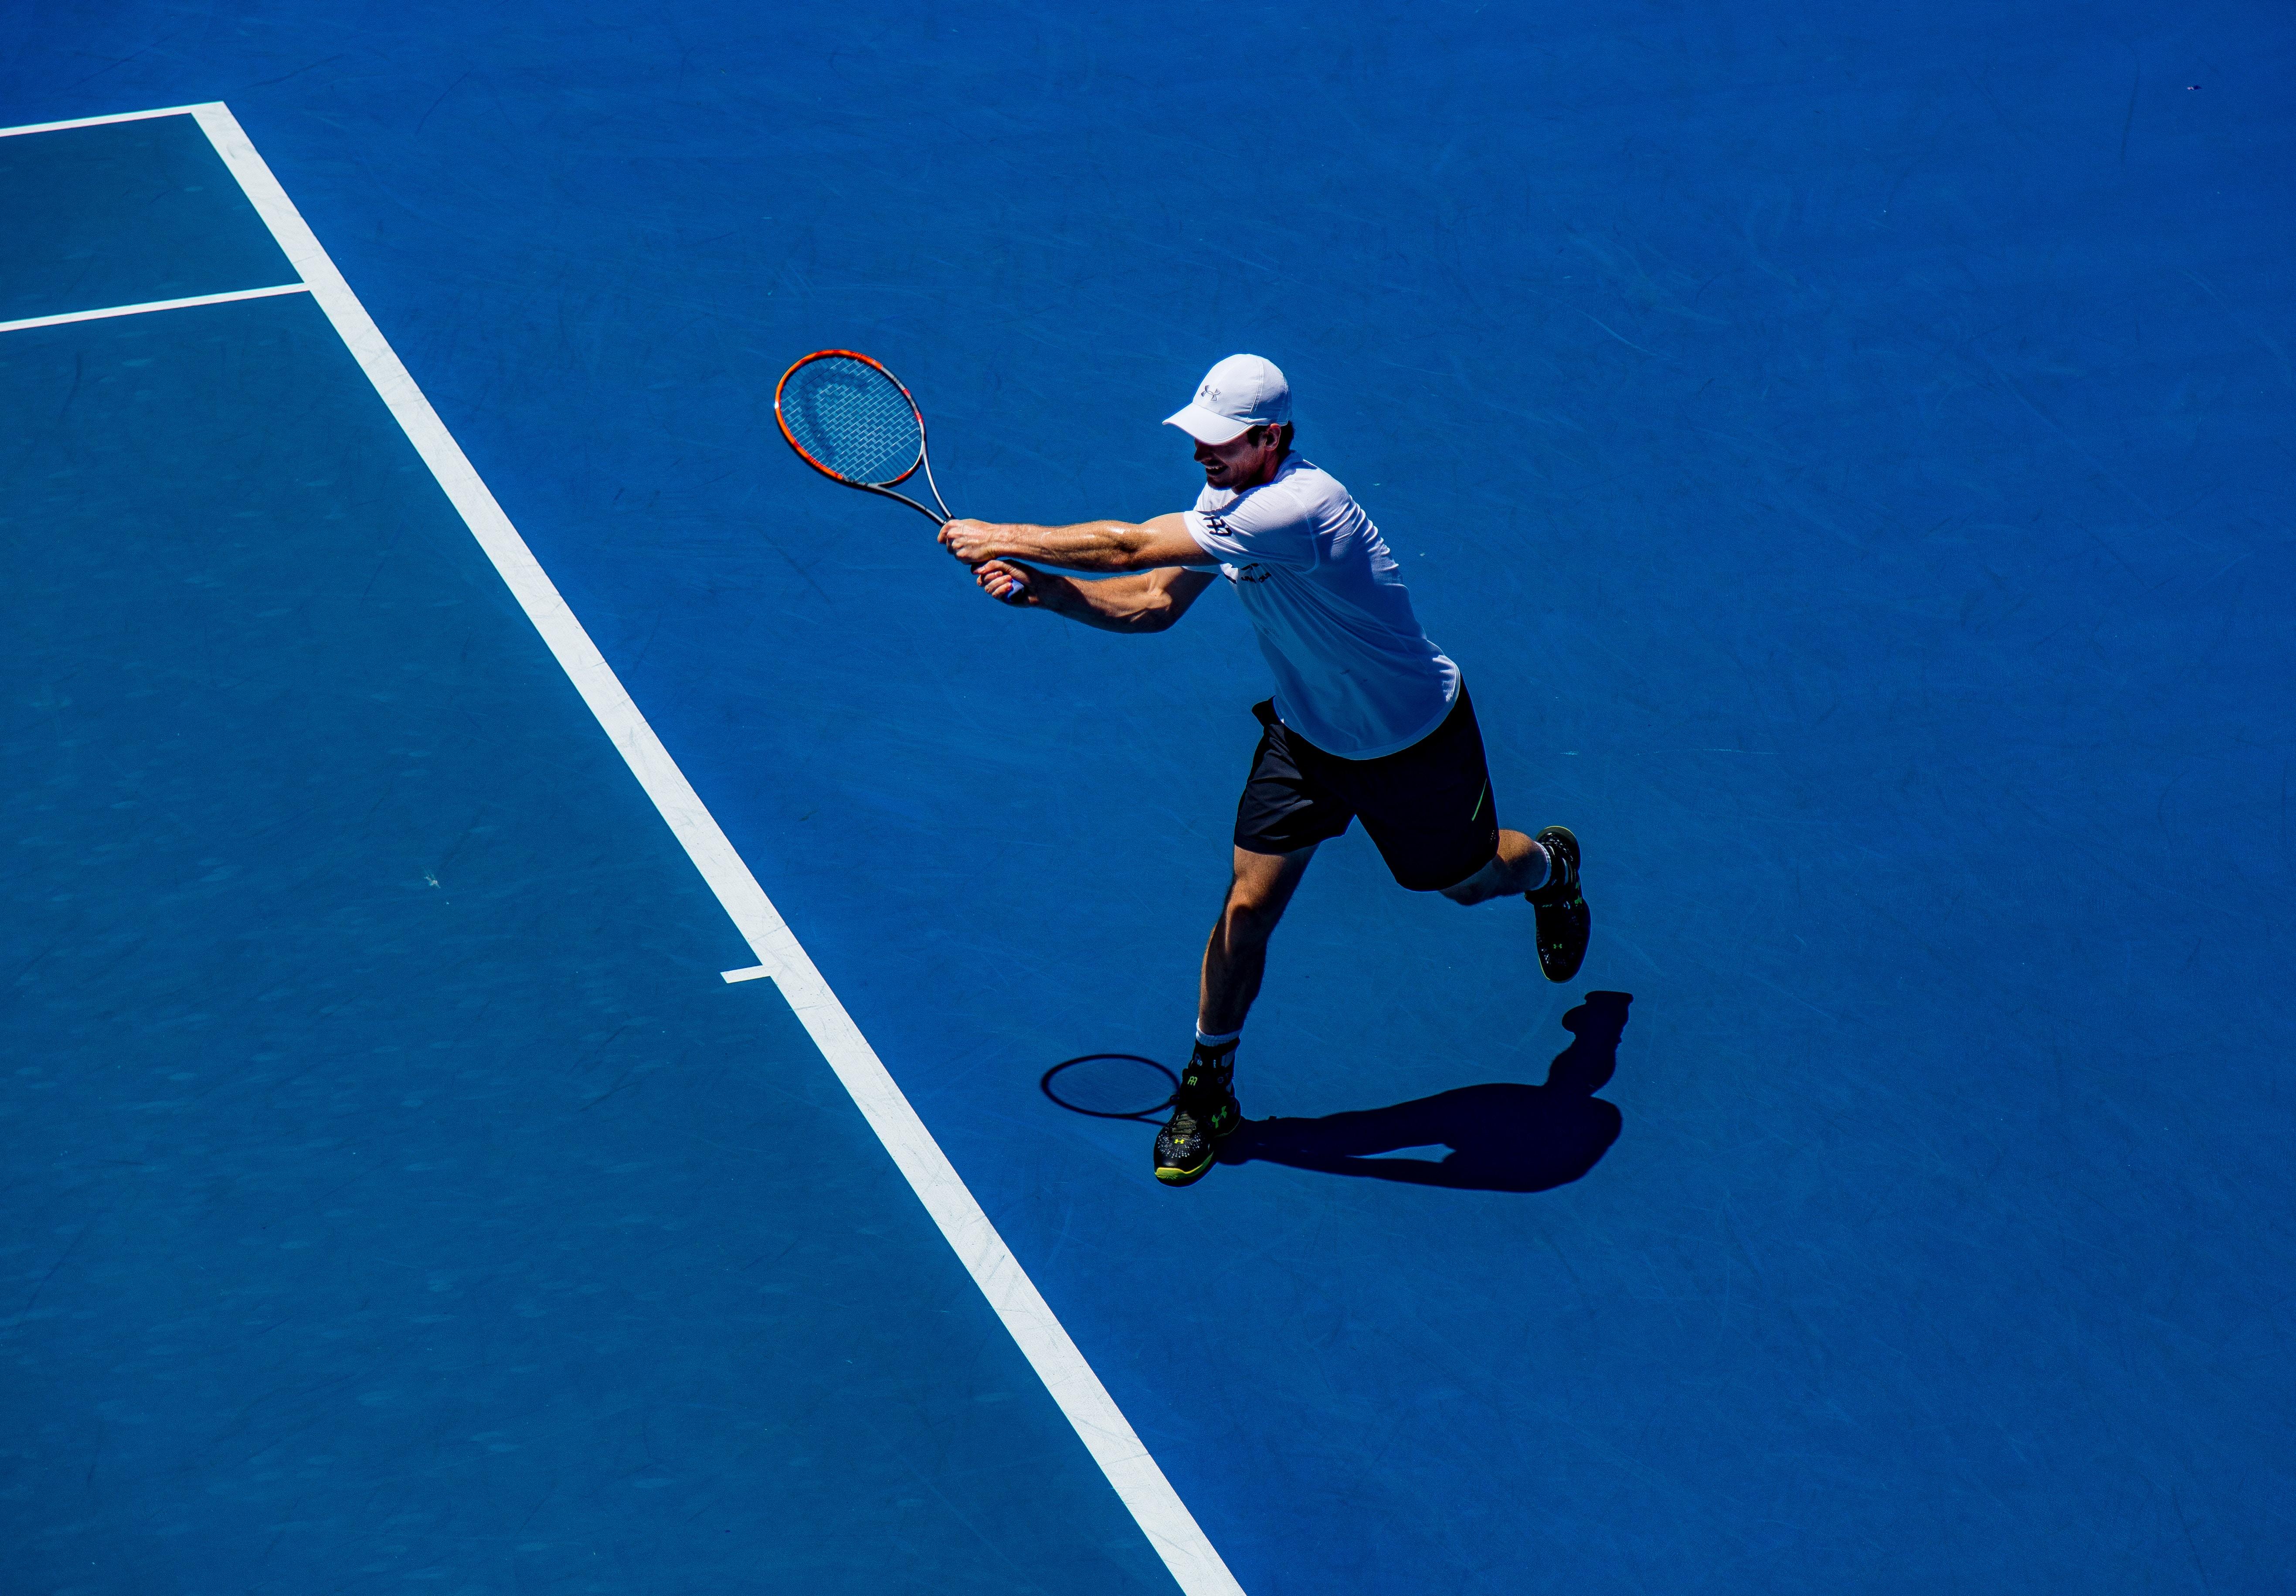 Photo Of Tennis Player By Christopher Burns Via Unsplash.com